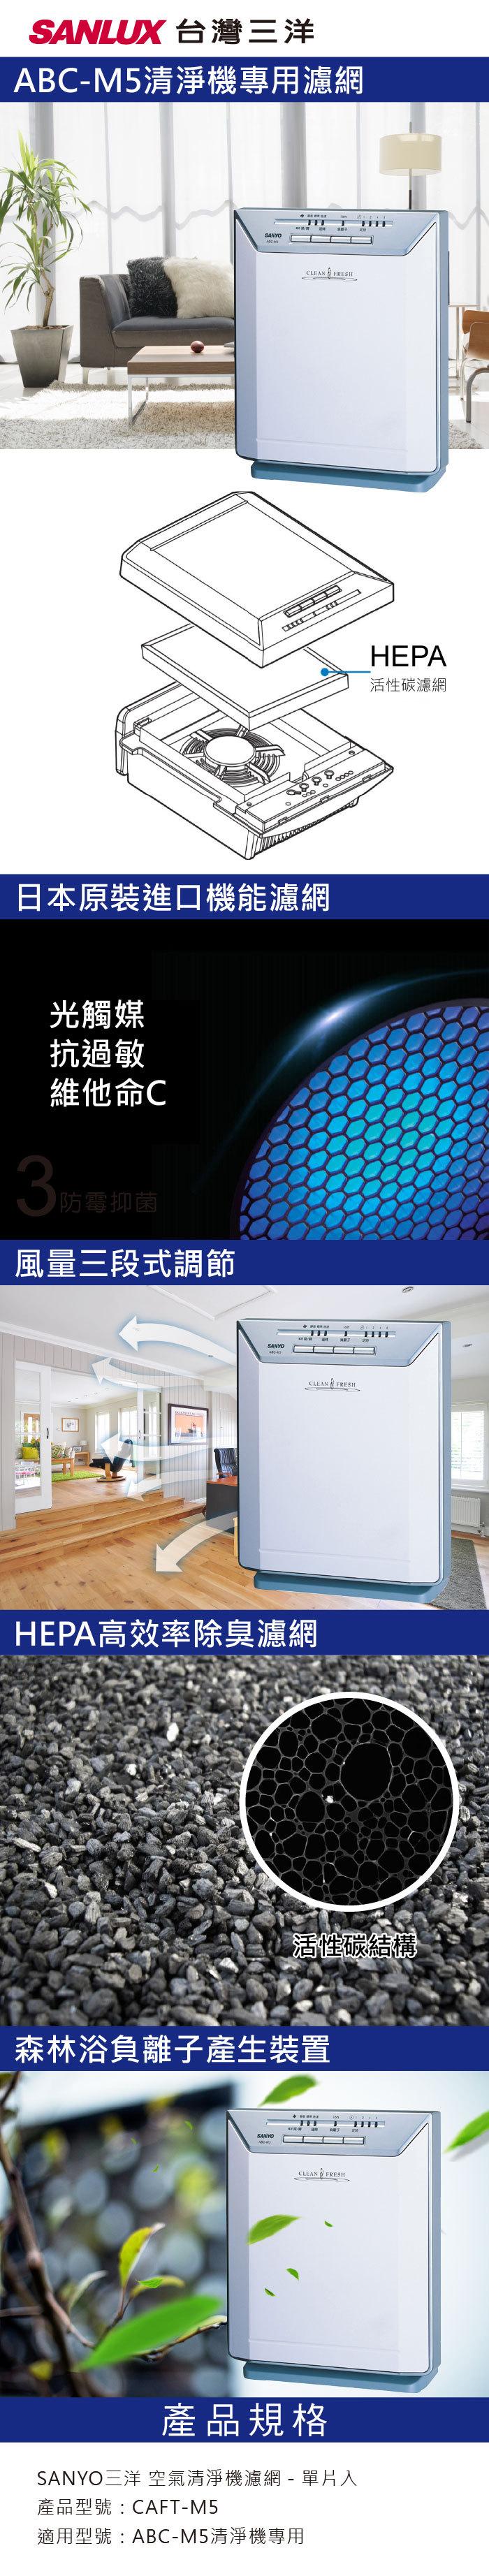 SANLUX 台灣三洋 CAFT-M5 空氣清淨機濾網 單片裝 適用ABC-M5